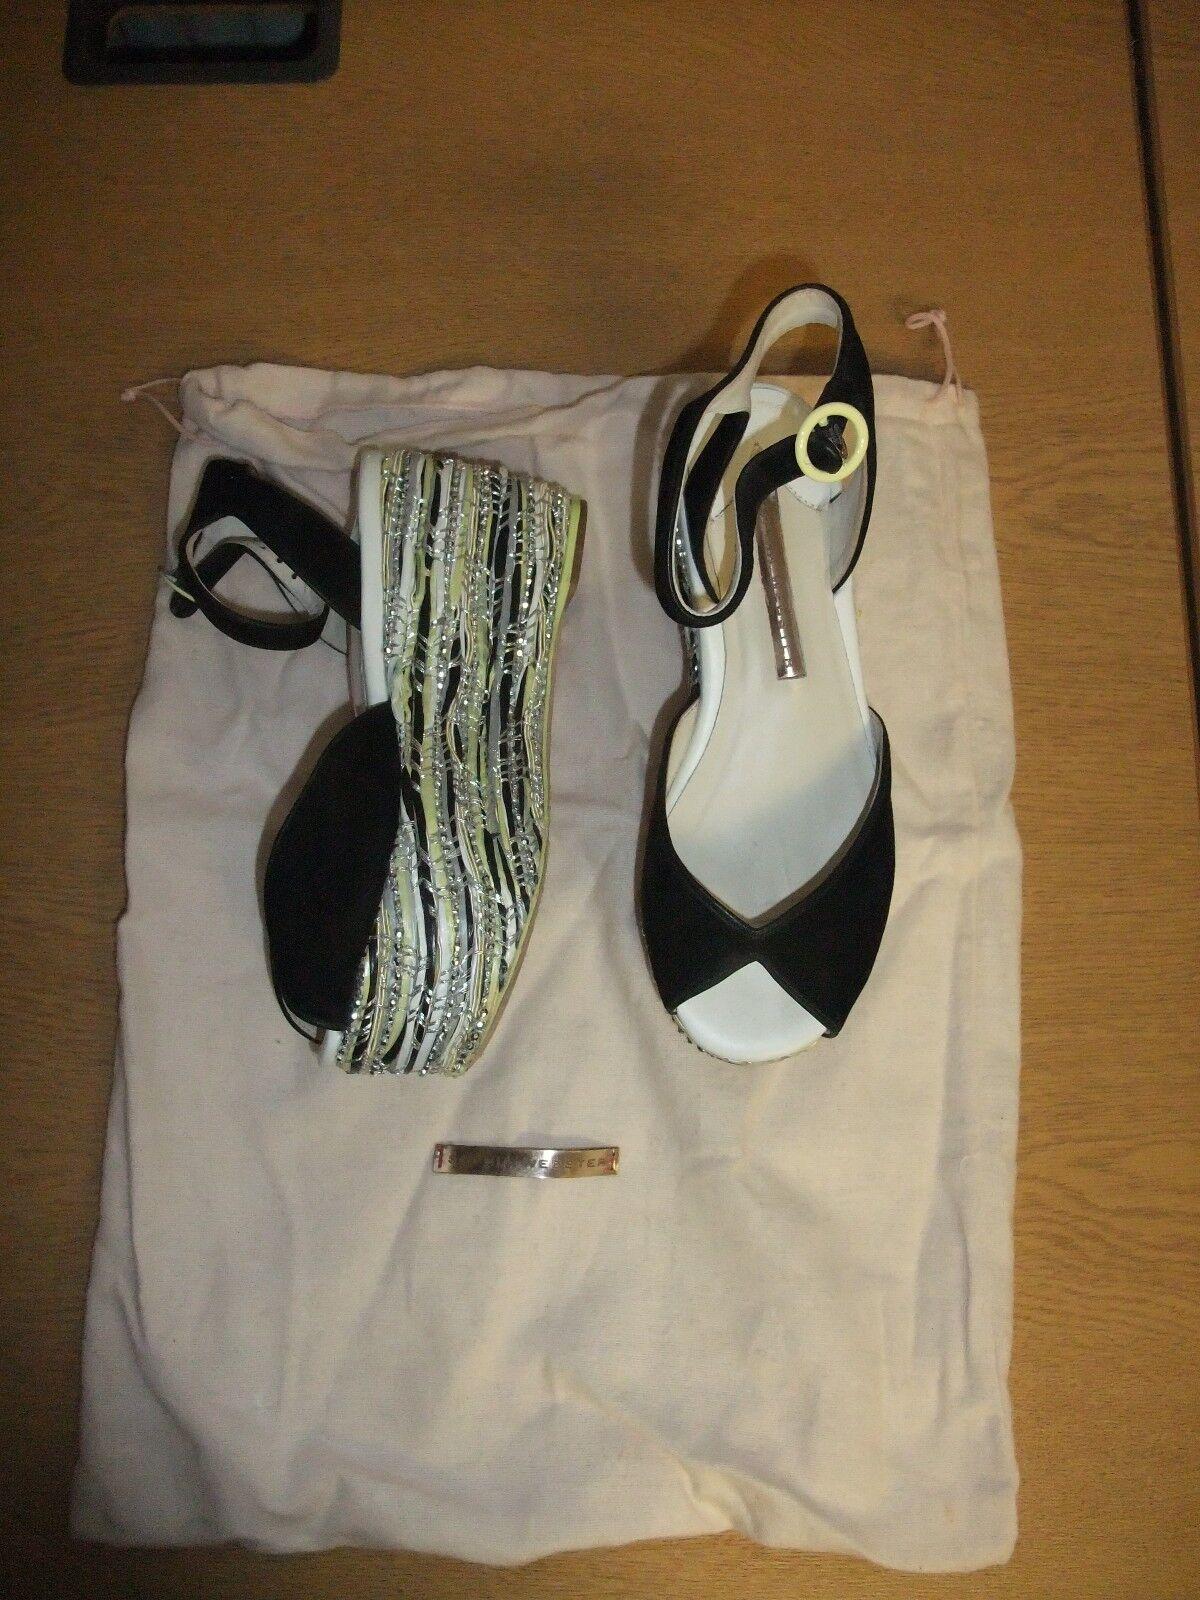 Ladies Shoes Sophia Webster EU 35 black with black/white/silver platform 3257